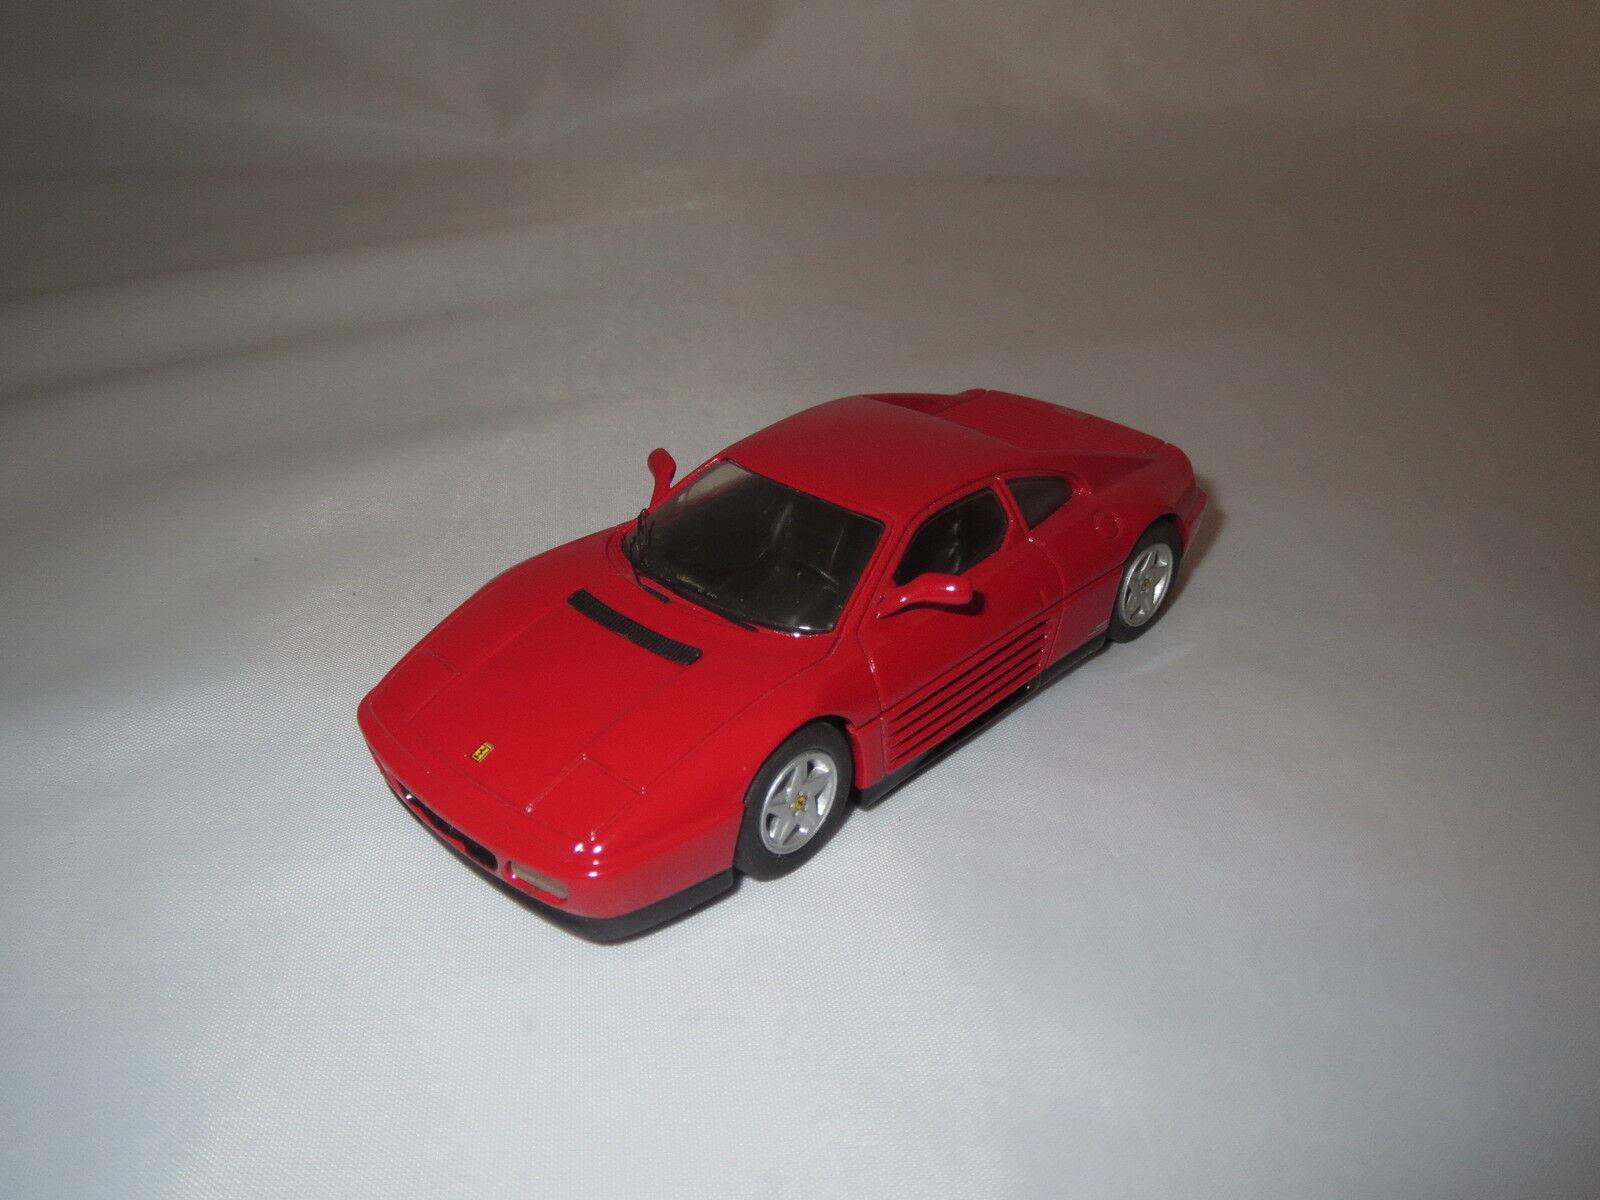 Century ferrari 348 GTB  1990  nº 19 (rosso) 1 43 embalaje original